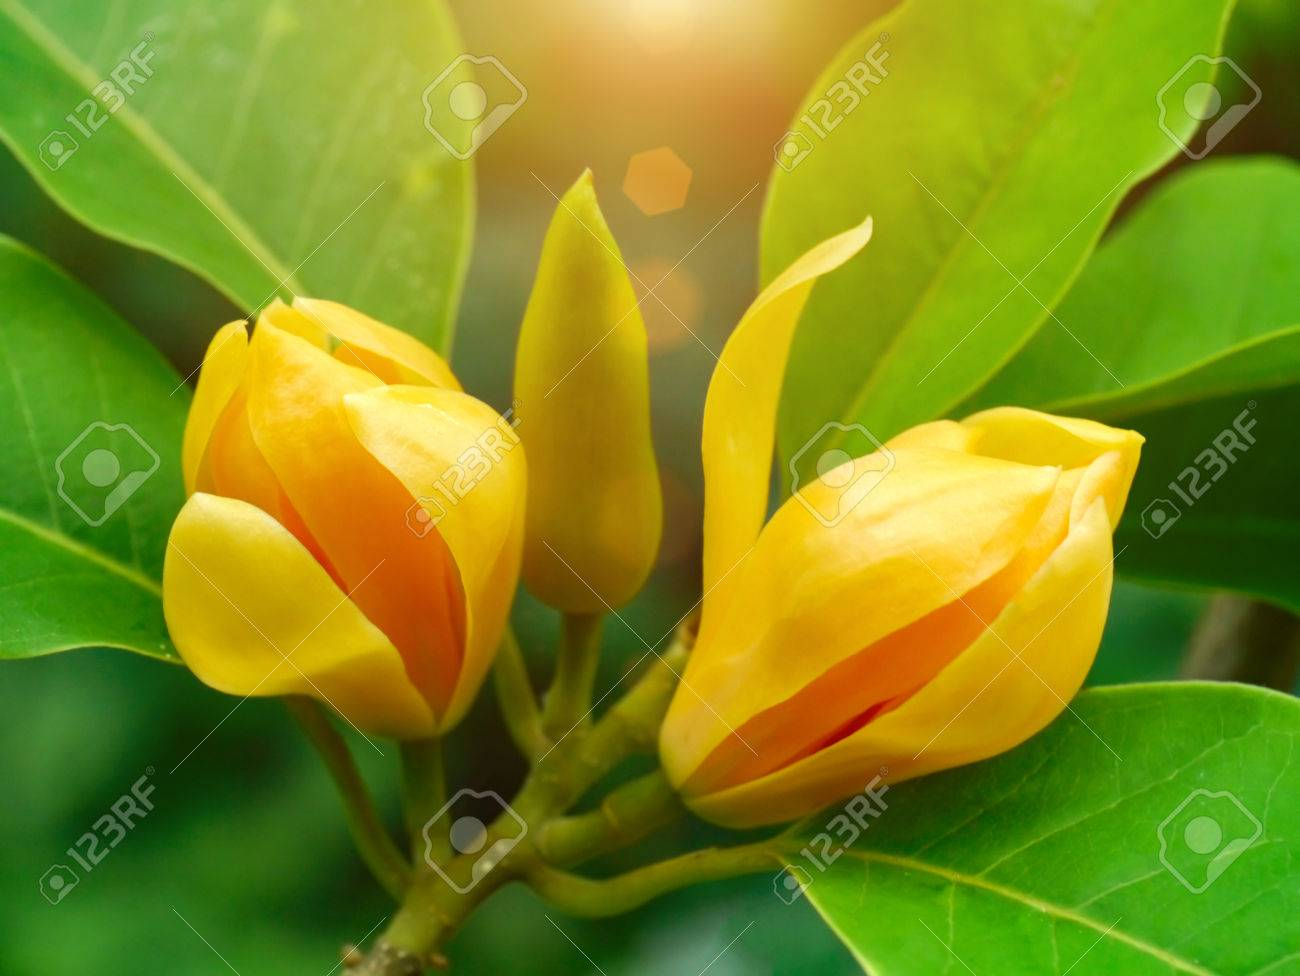 Fragrant Yellow Flowers Refreshing Are Blooming Champaka Stock